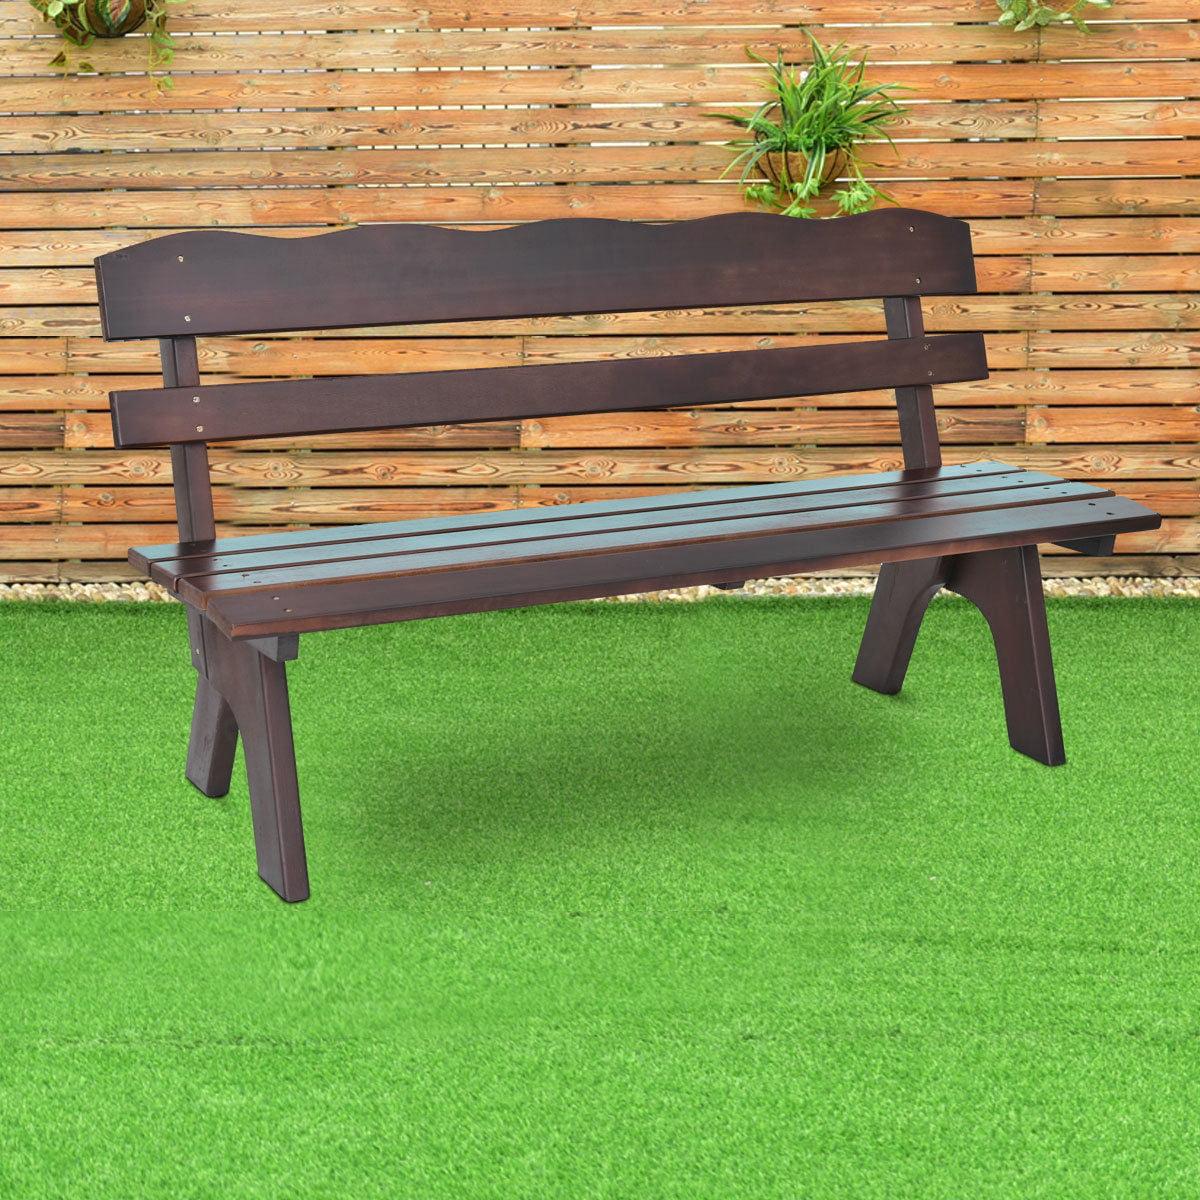 Costway 5ft 3 Seats Outdoor Garden Bench Chair Wood Frame Yard Deck Furniture Brown